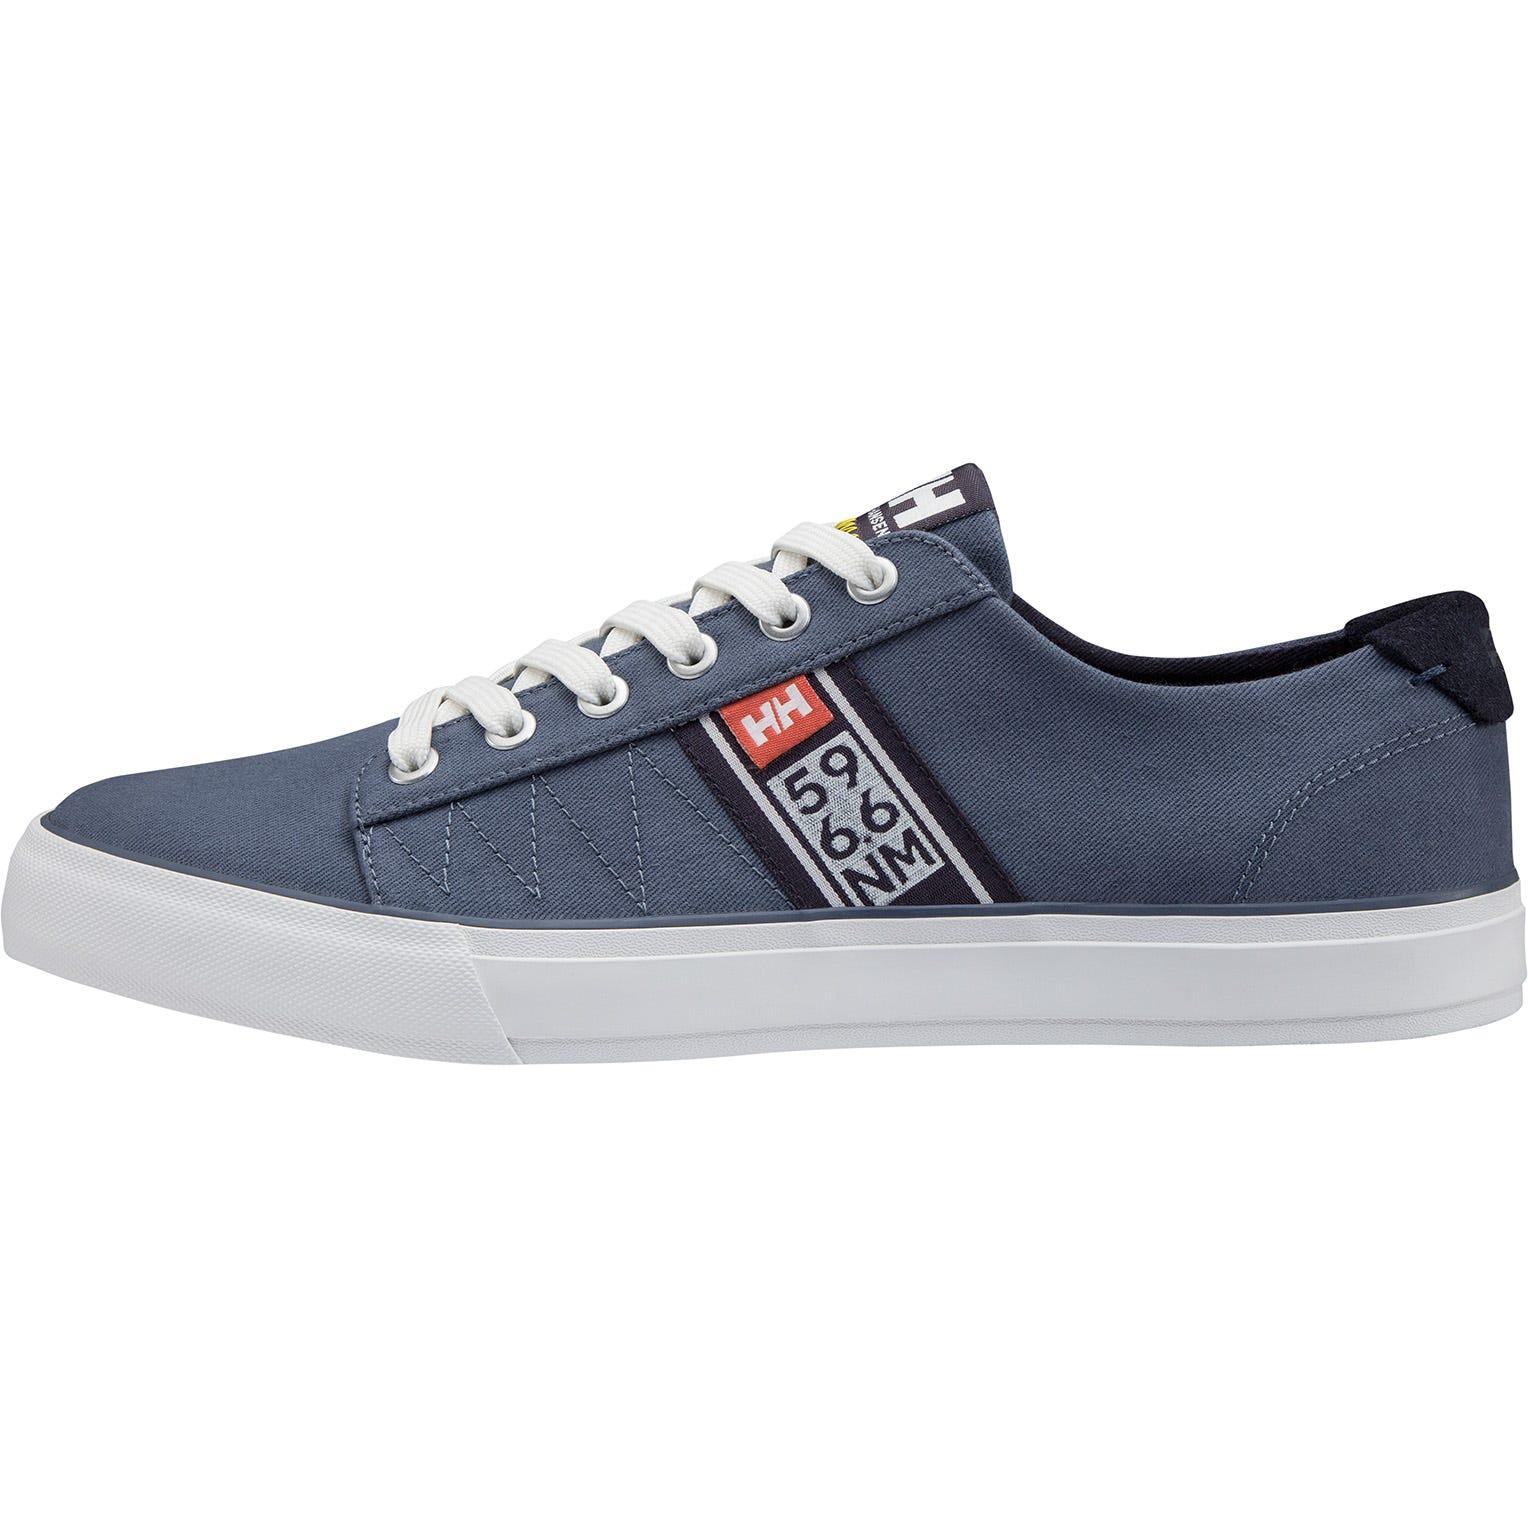 Helly Hansen Salt Flag F1 Mens :casual Shoe Blue 46/11.5